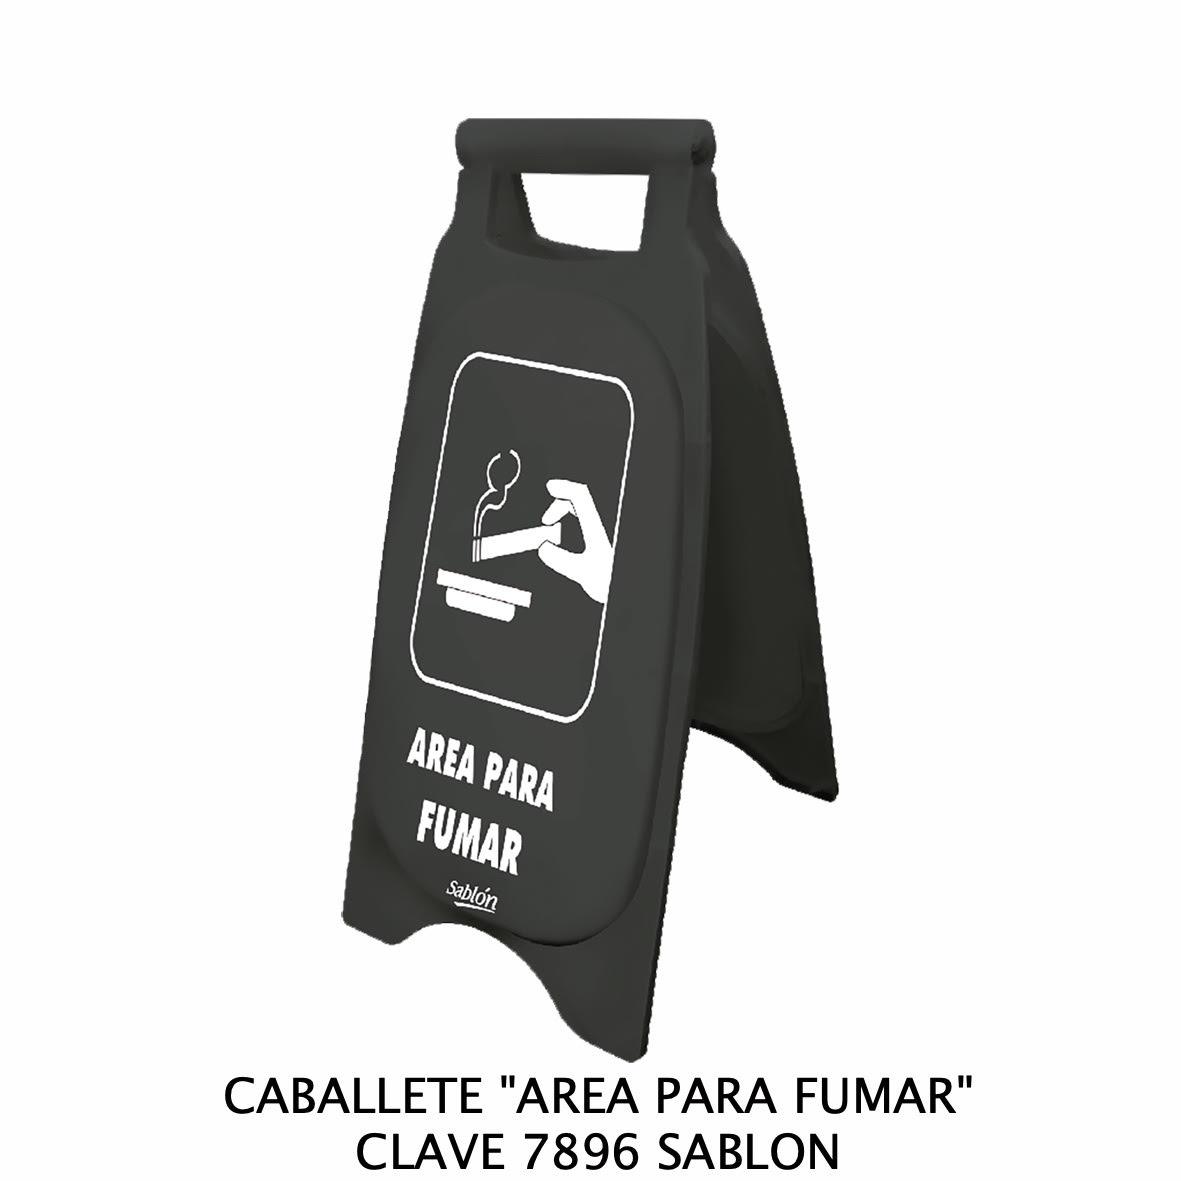 Caballete con señal ÁREA PARA FUMAR Clave 7886 de Sablón